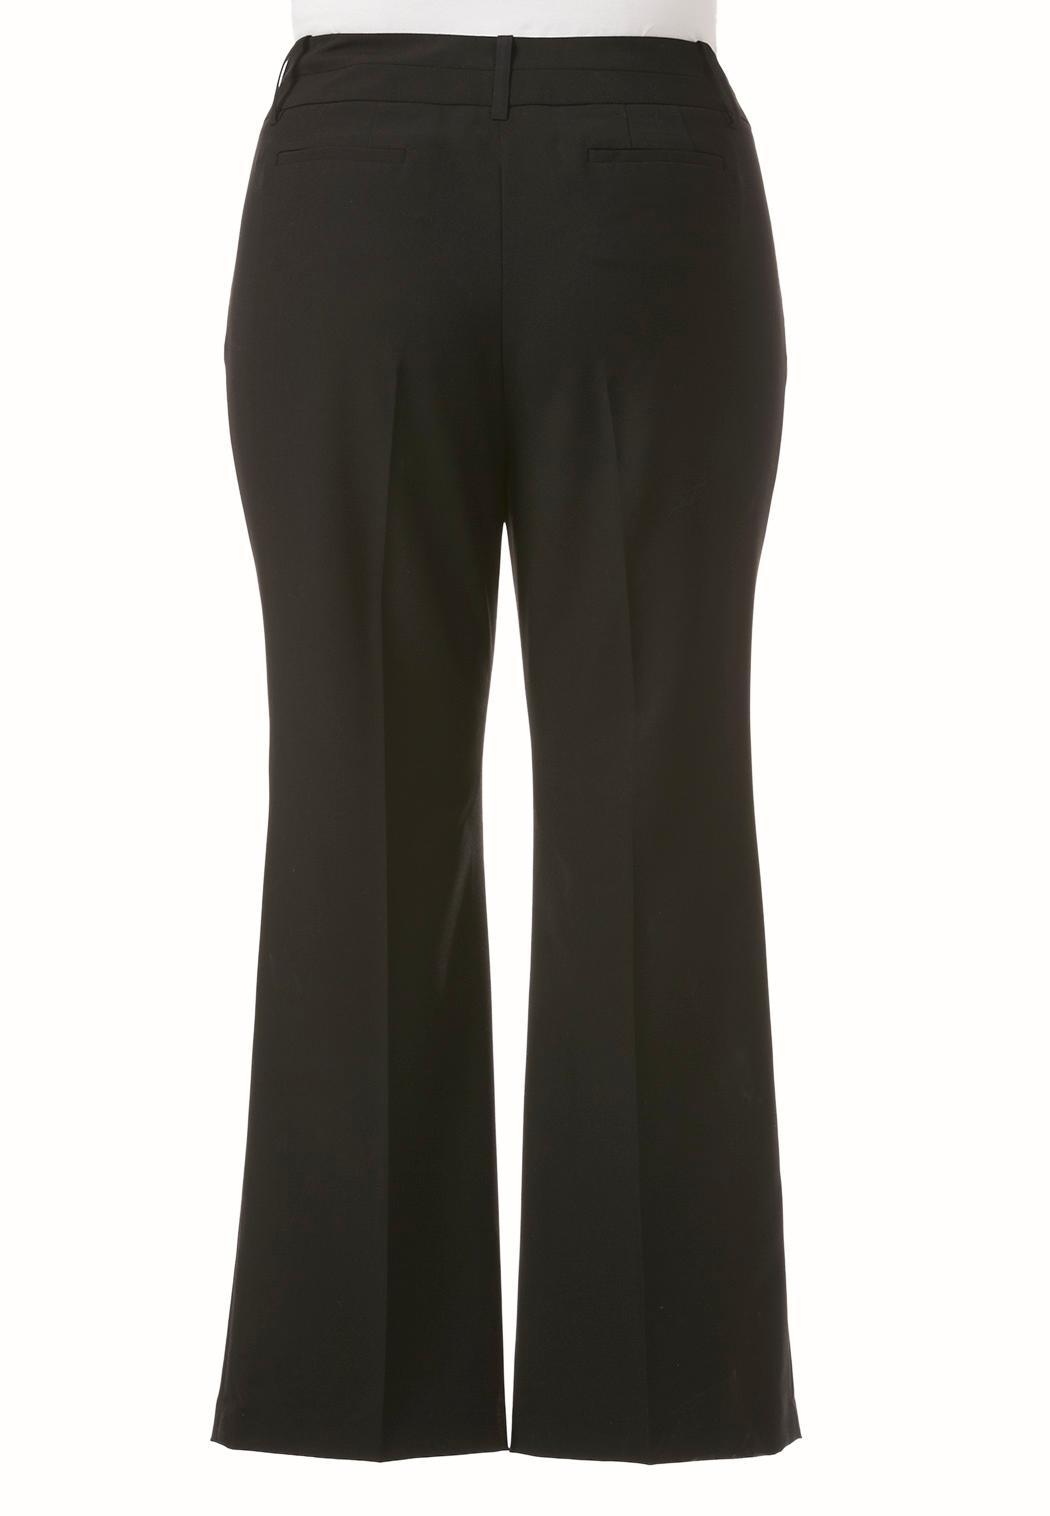 Plus Size Curvy Shape Enhancing Trousers (Item #37635687)